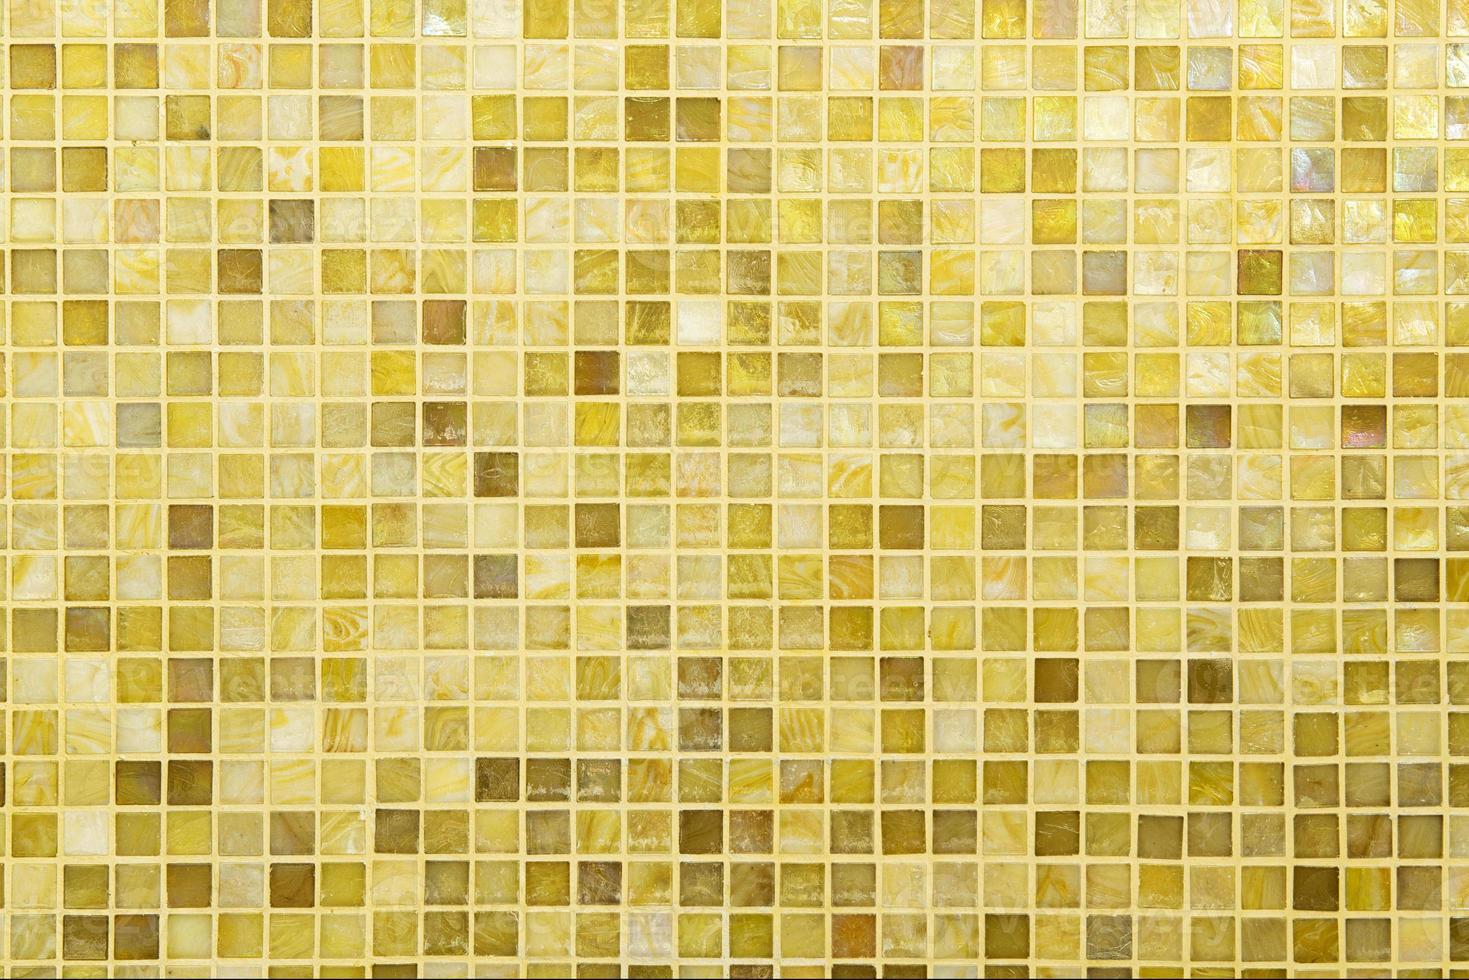 telha de mosaico foto